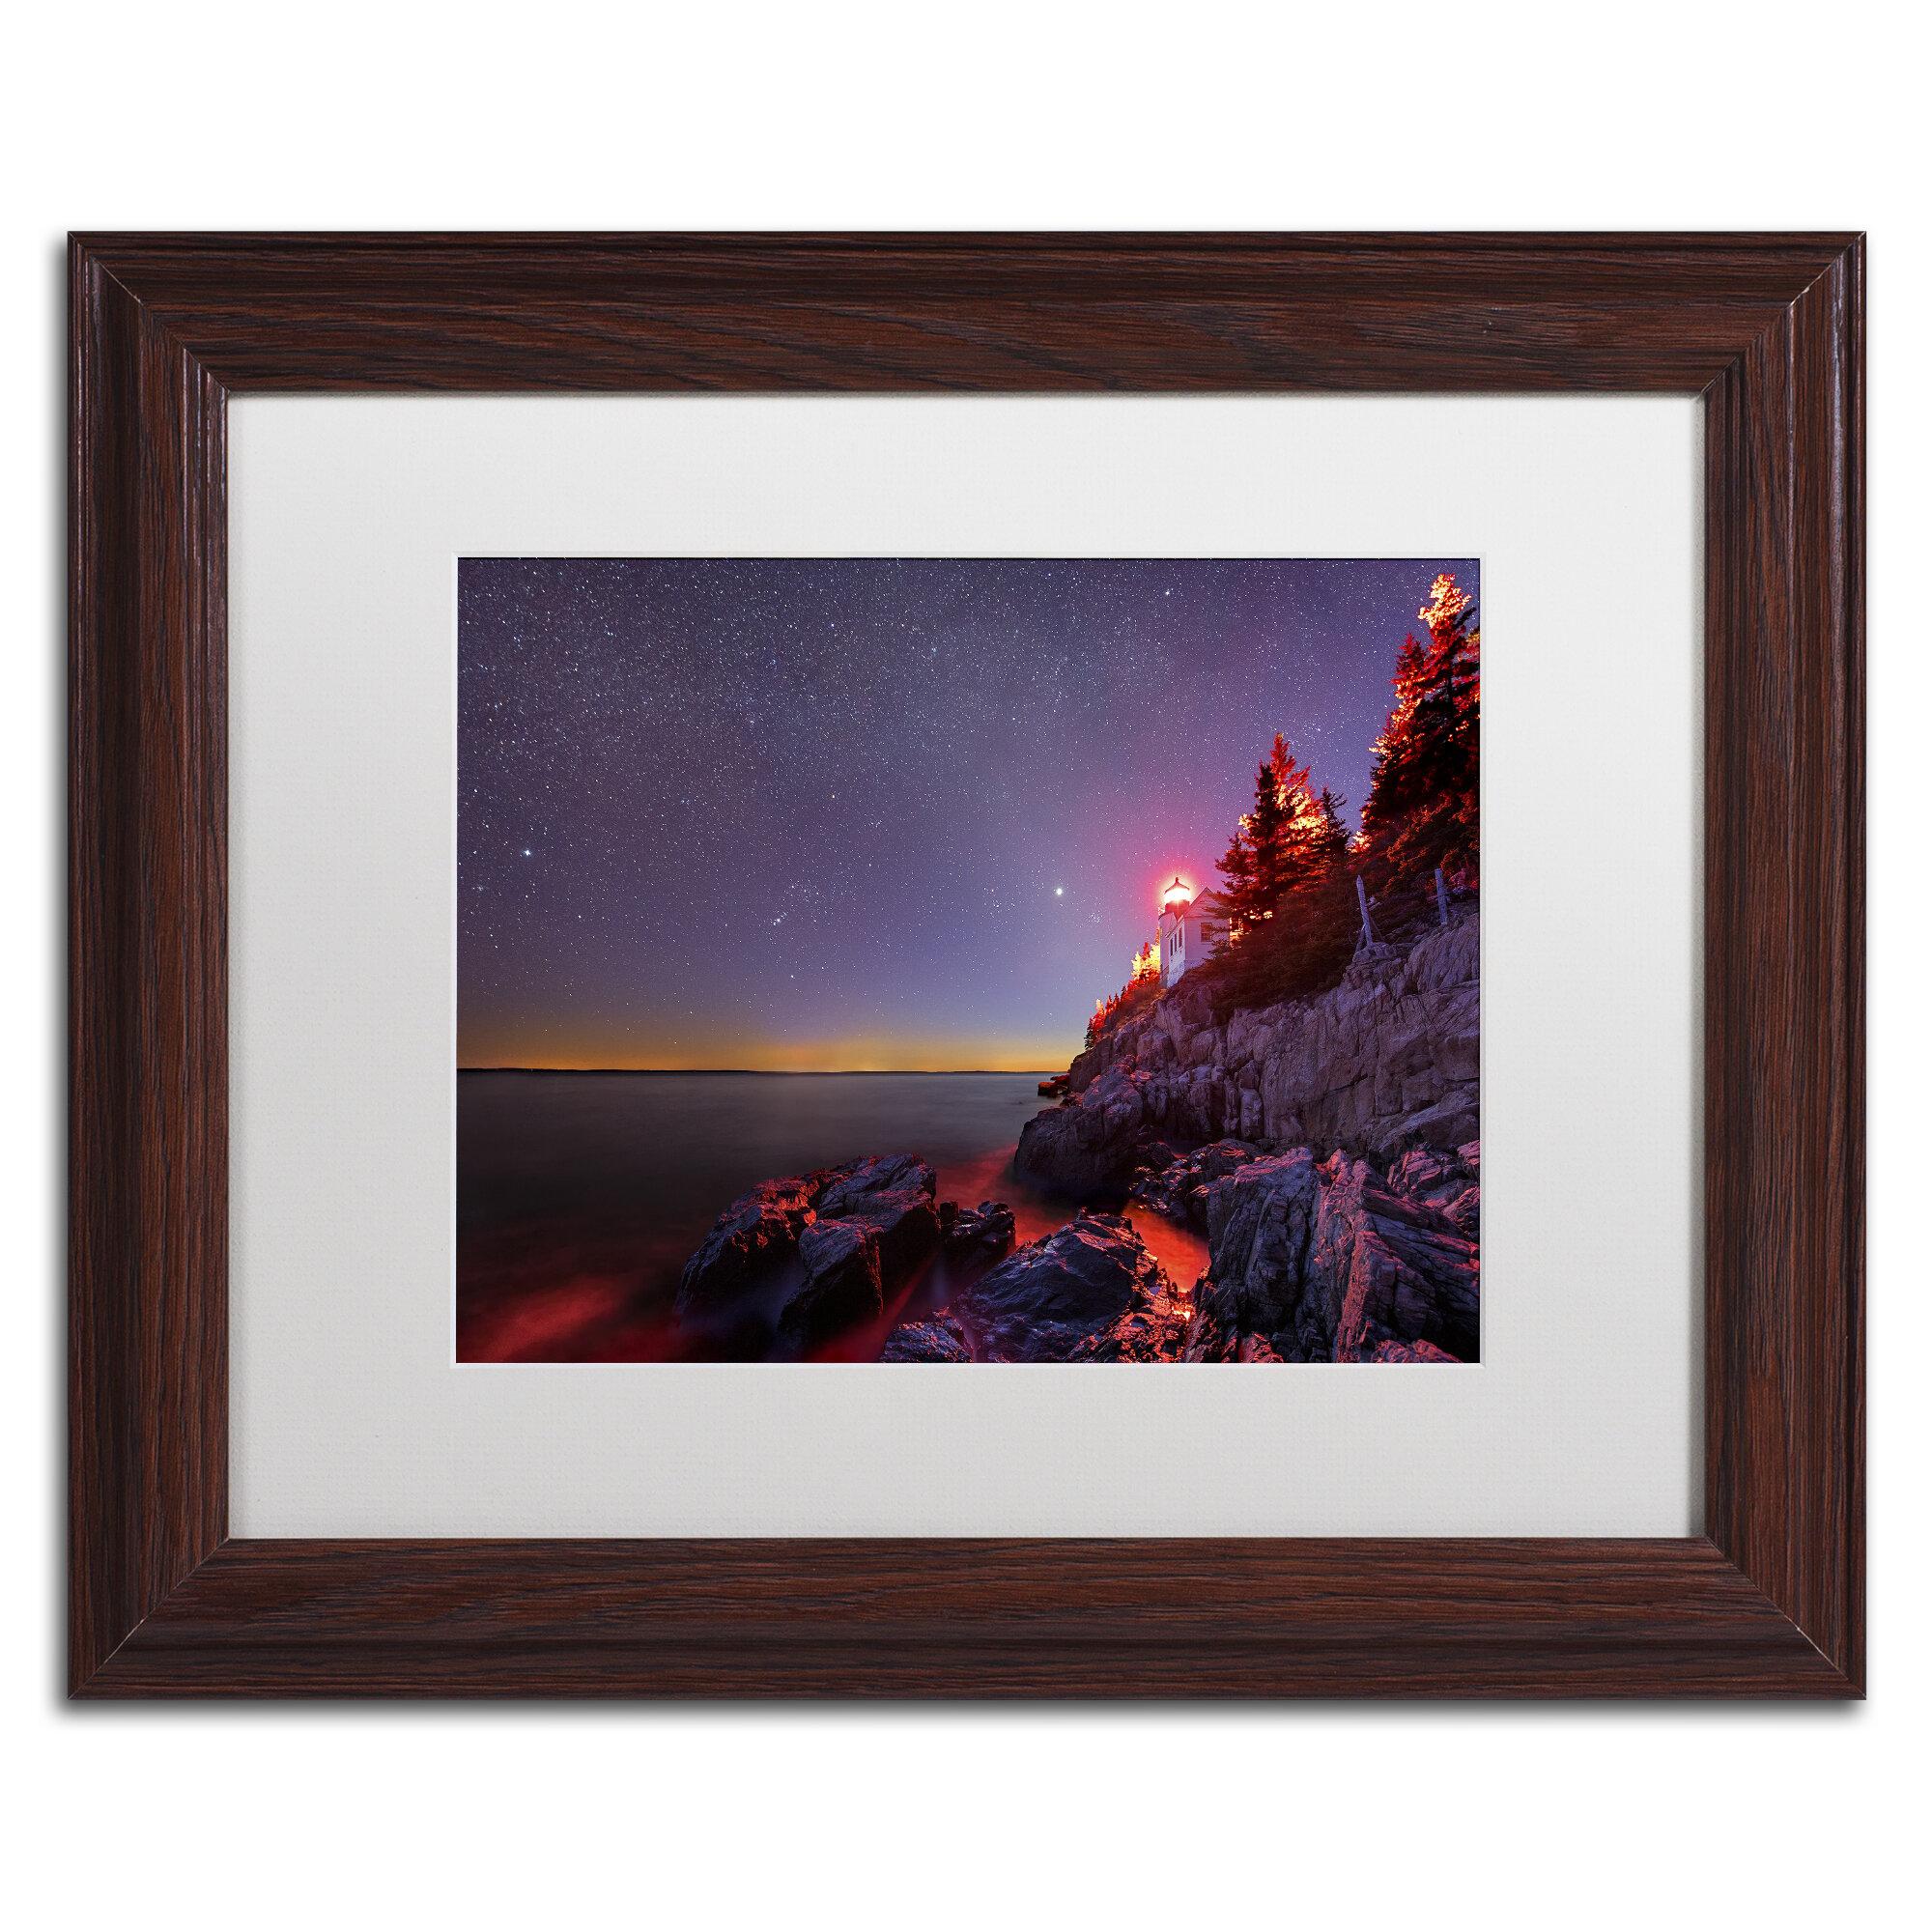 Trademark Art Red Lantern Framed Graphic Art On Canvas Wayfair